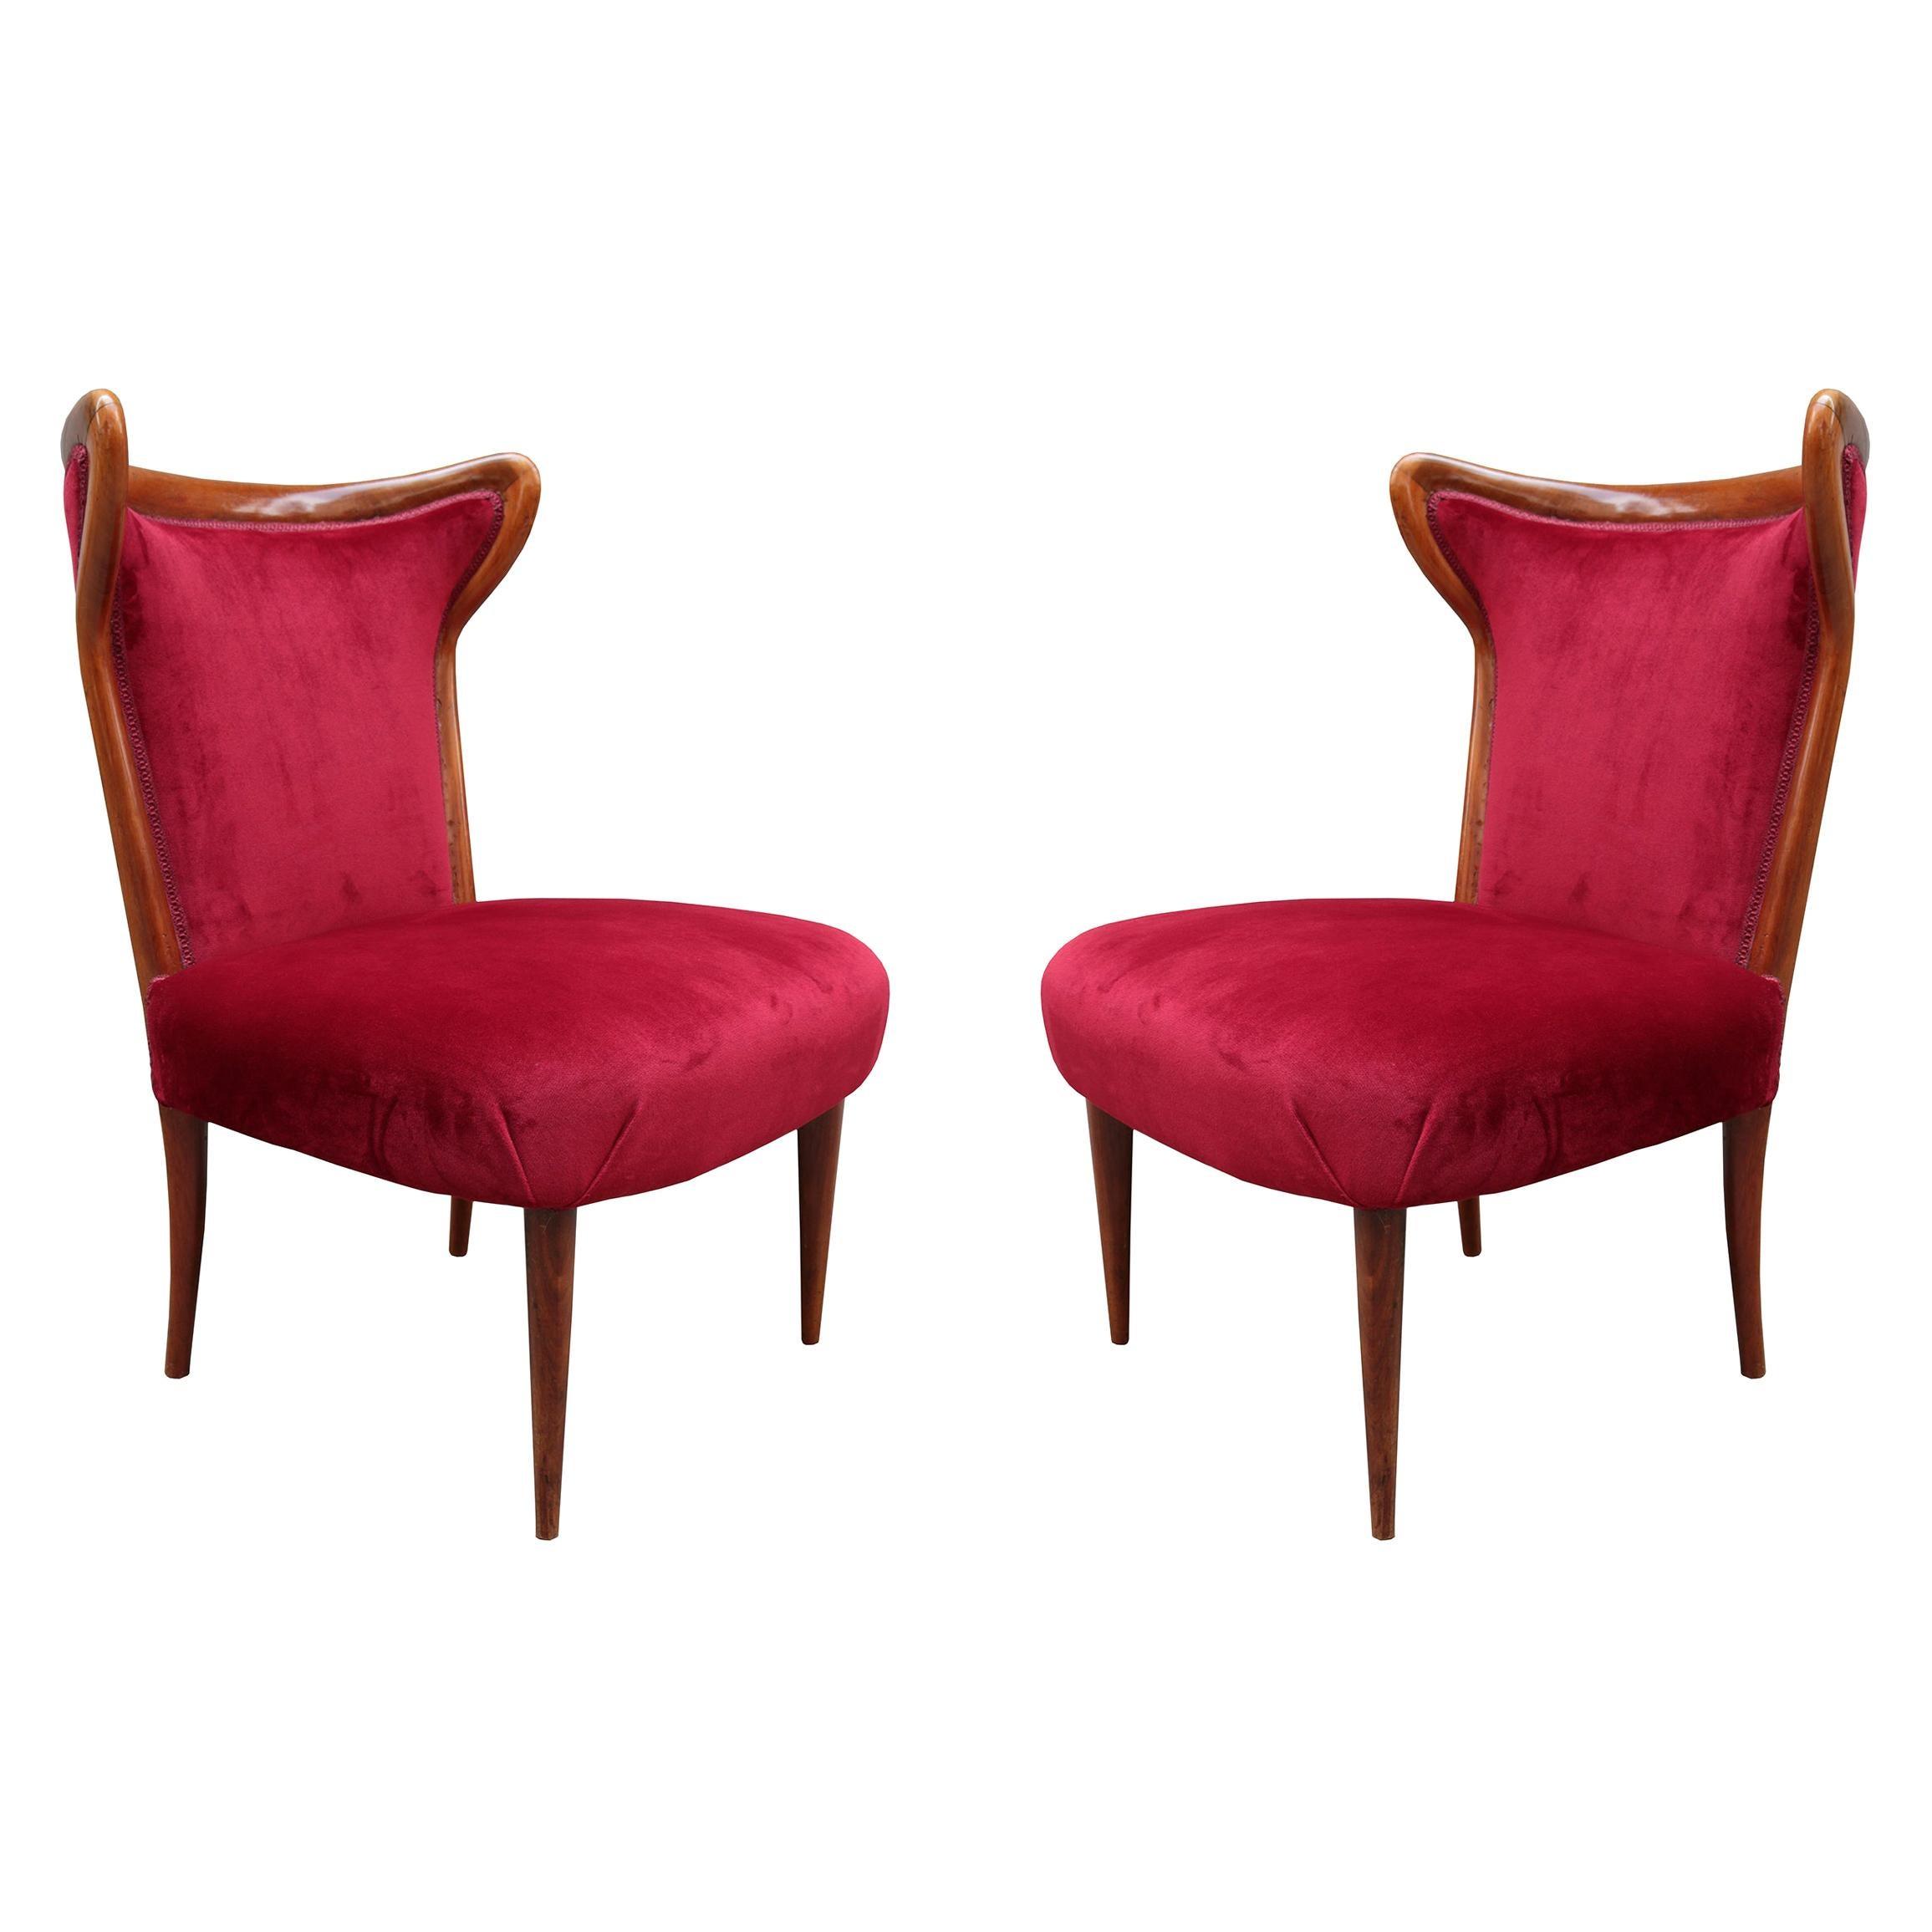 Pair of Italian Midcentury Pull Up Chairs